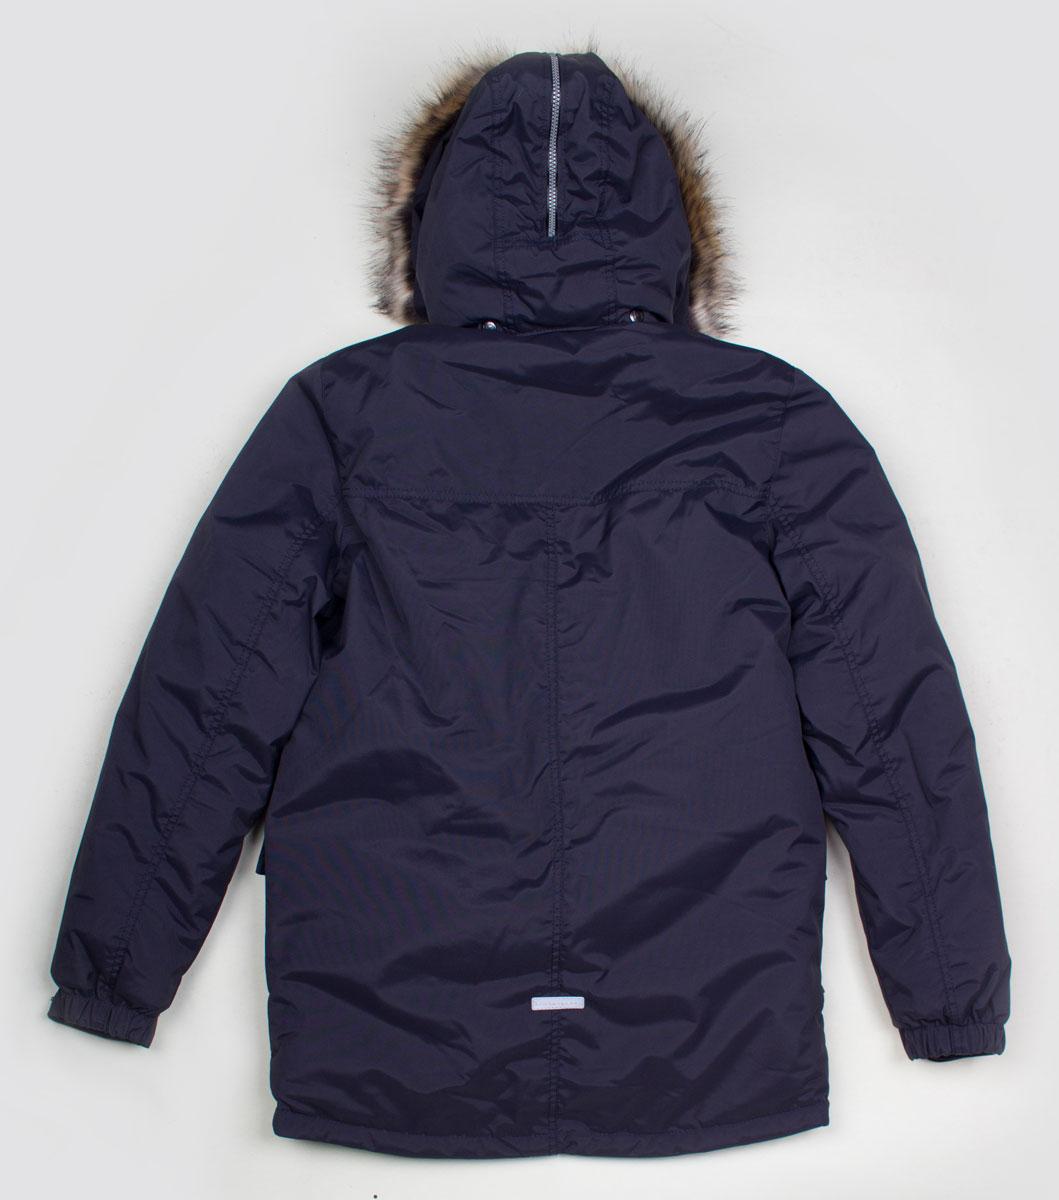 Lenne Woody куртка парка для мальчика темно-синий графит